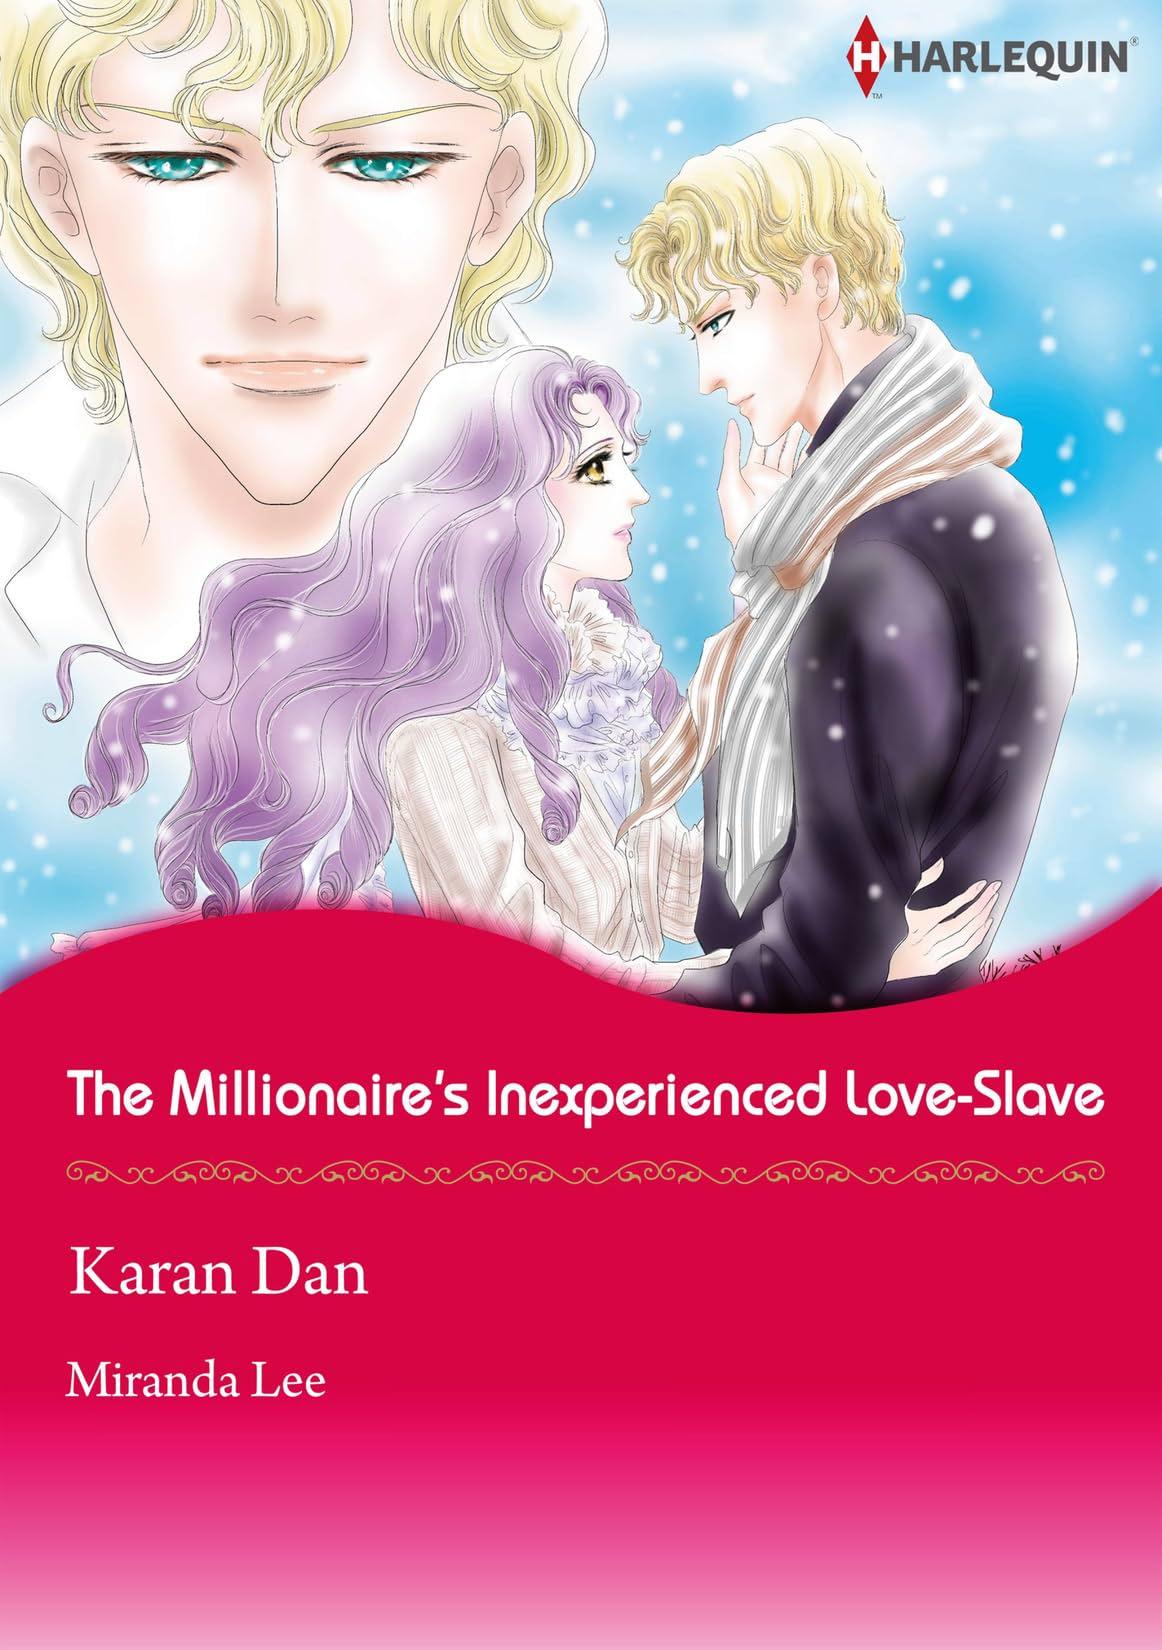 The Millionaire's Inexperienced Love-Slave